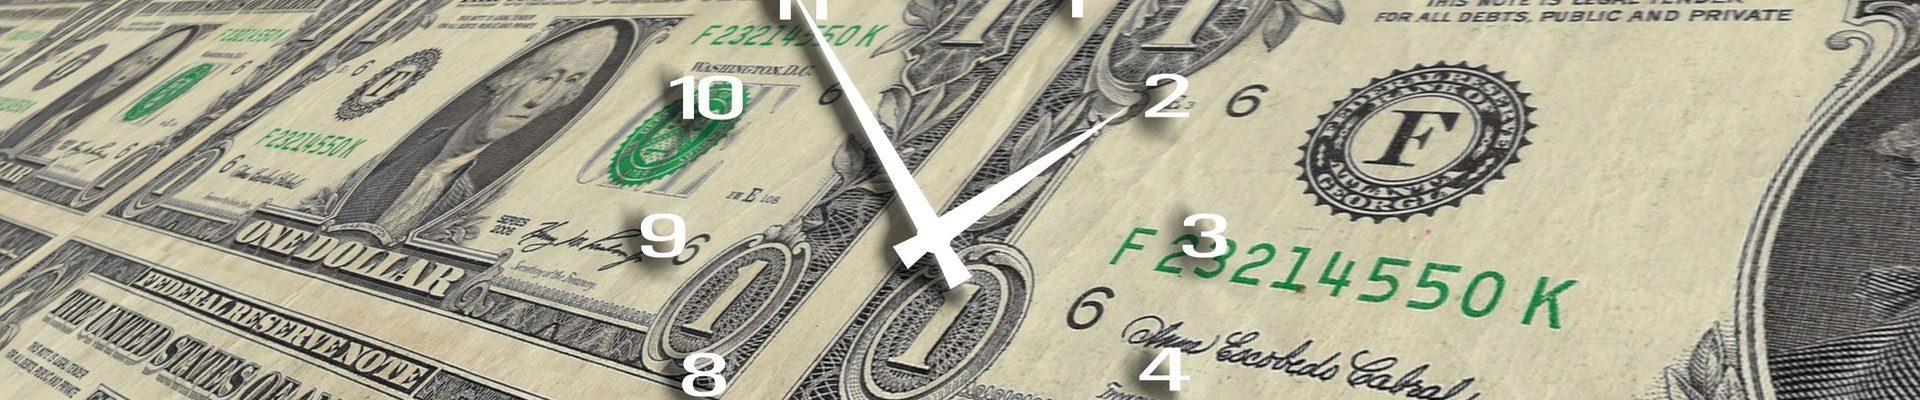 Деньги, кредиты, банки